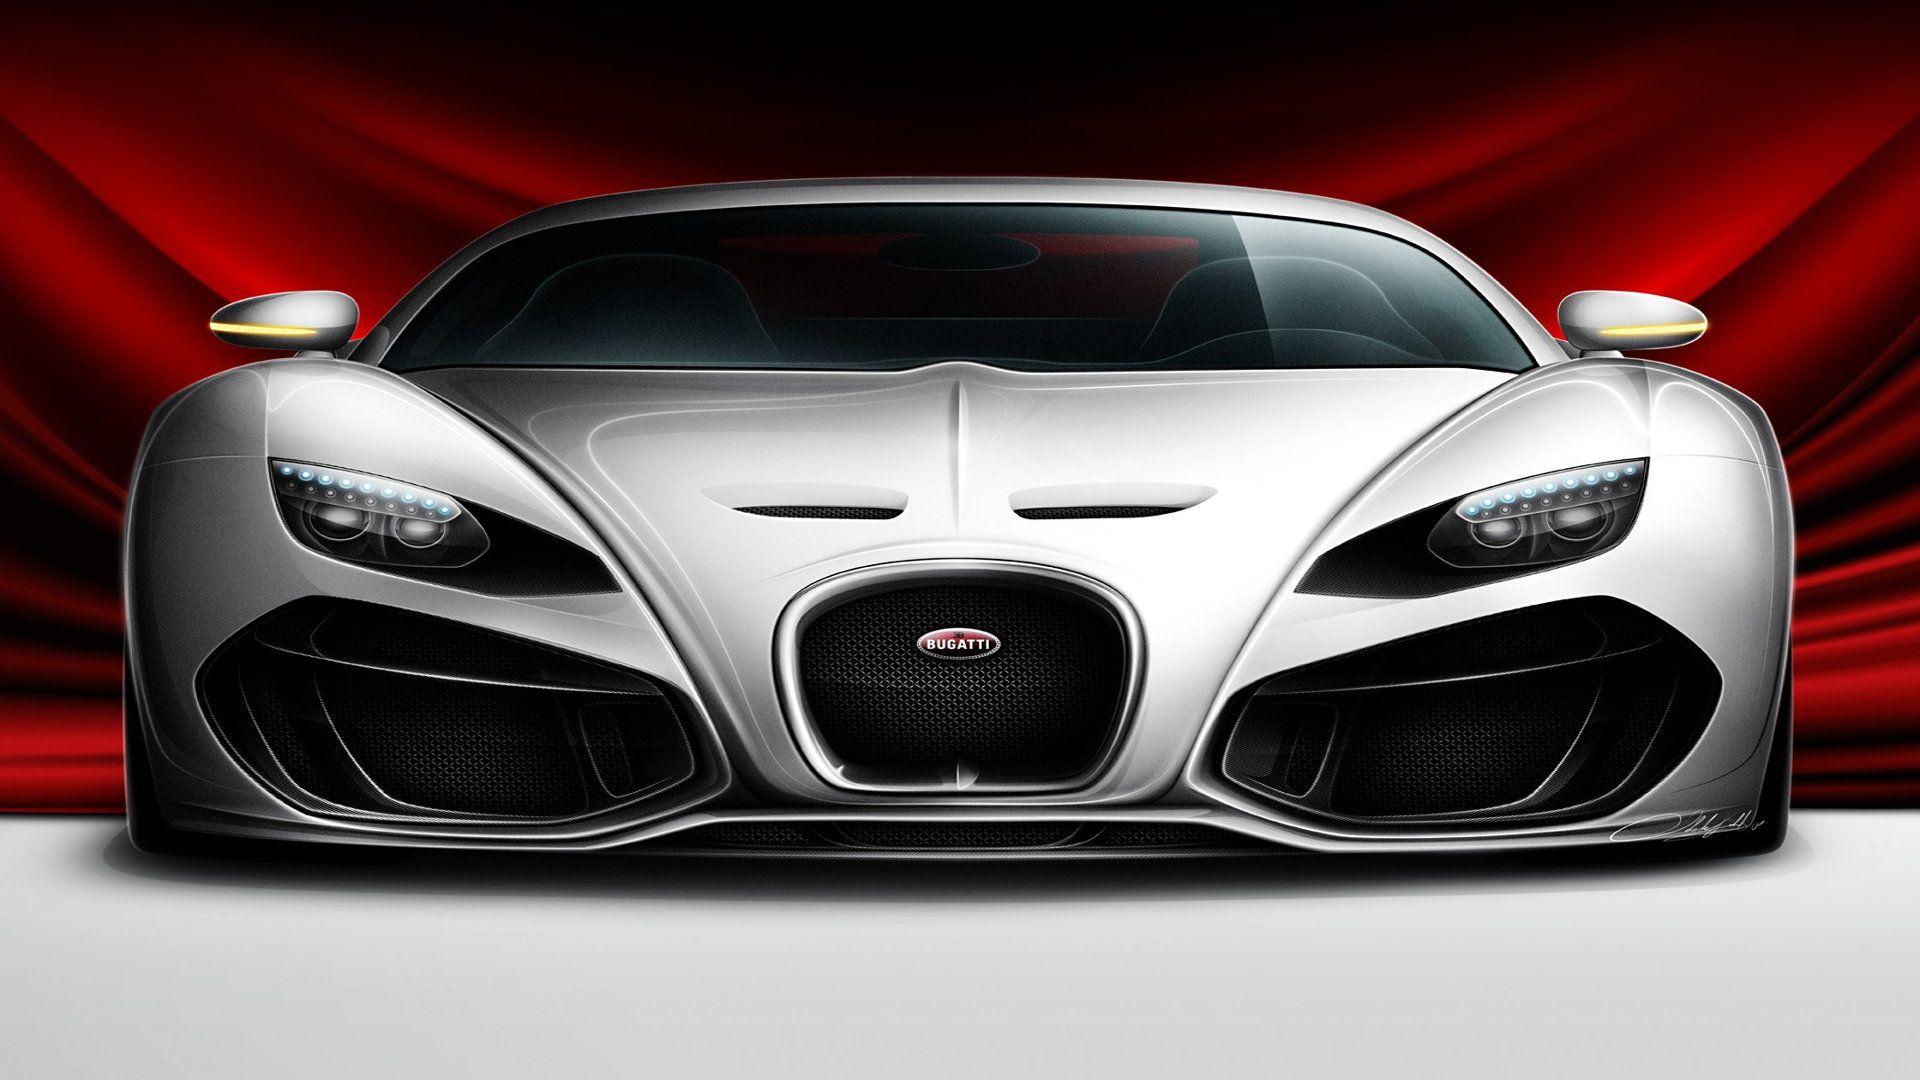 future cars 2020 - HD1920×1080